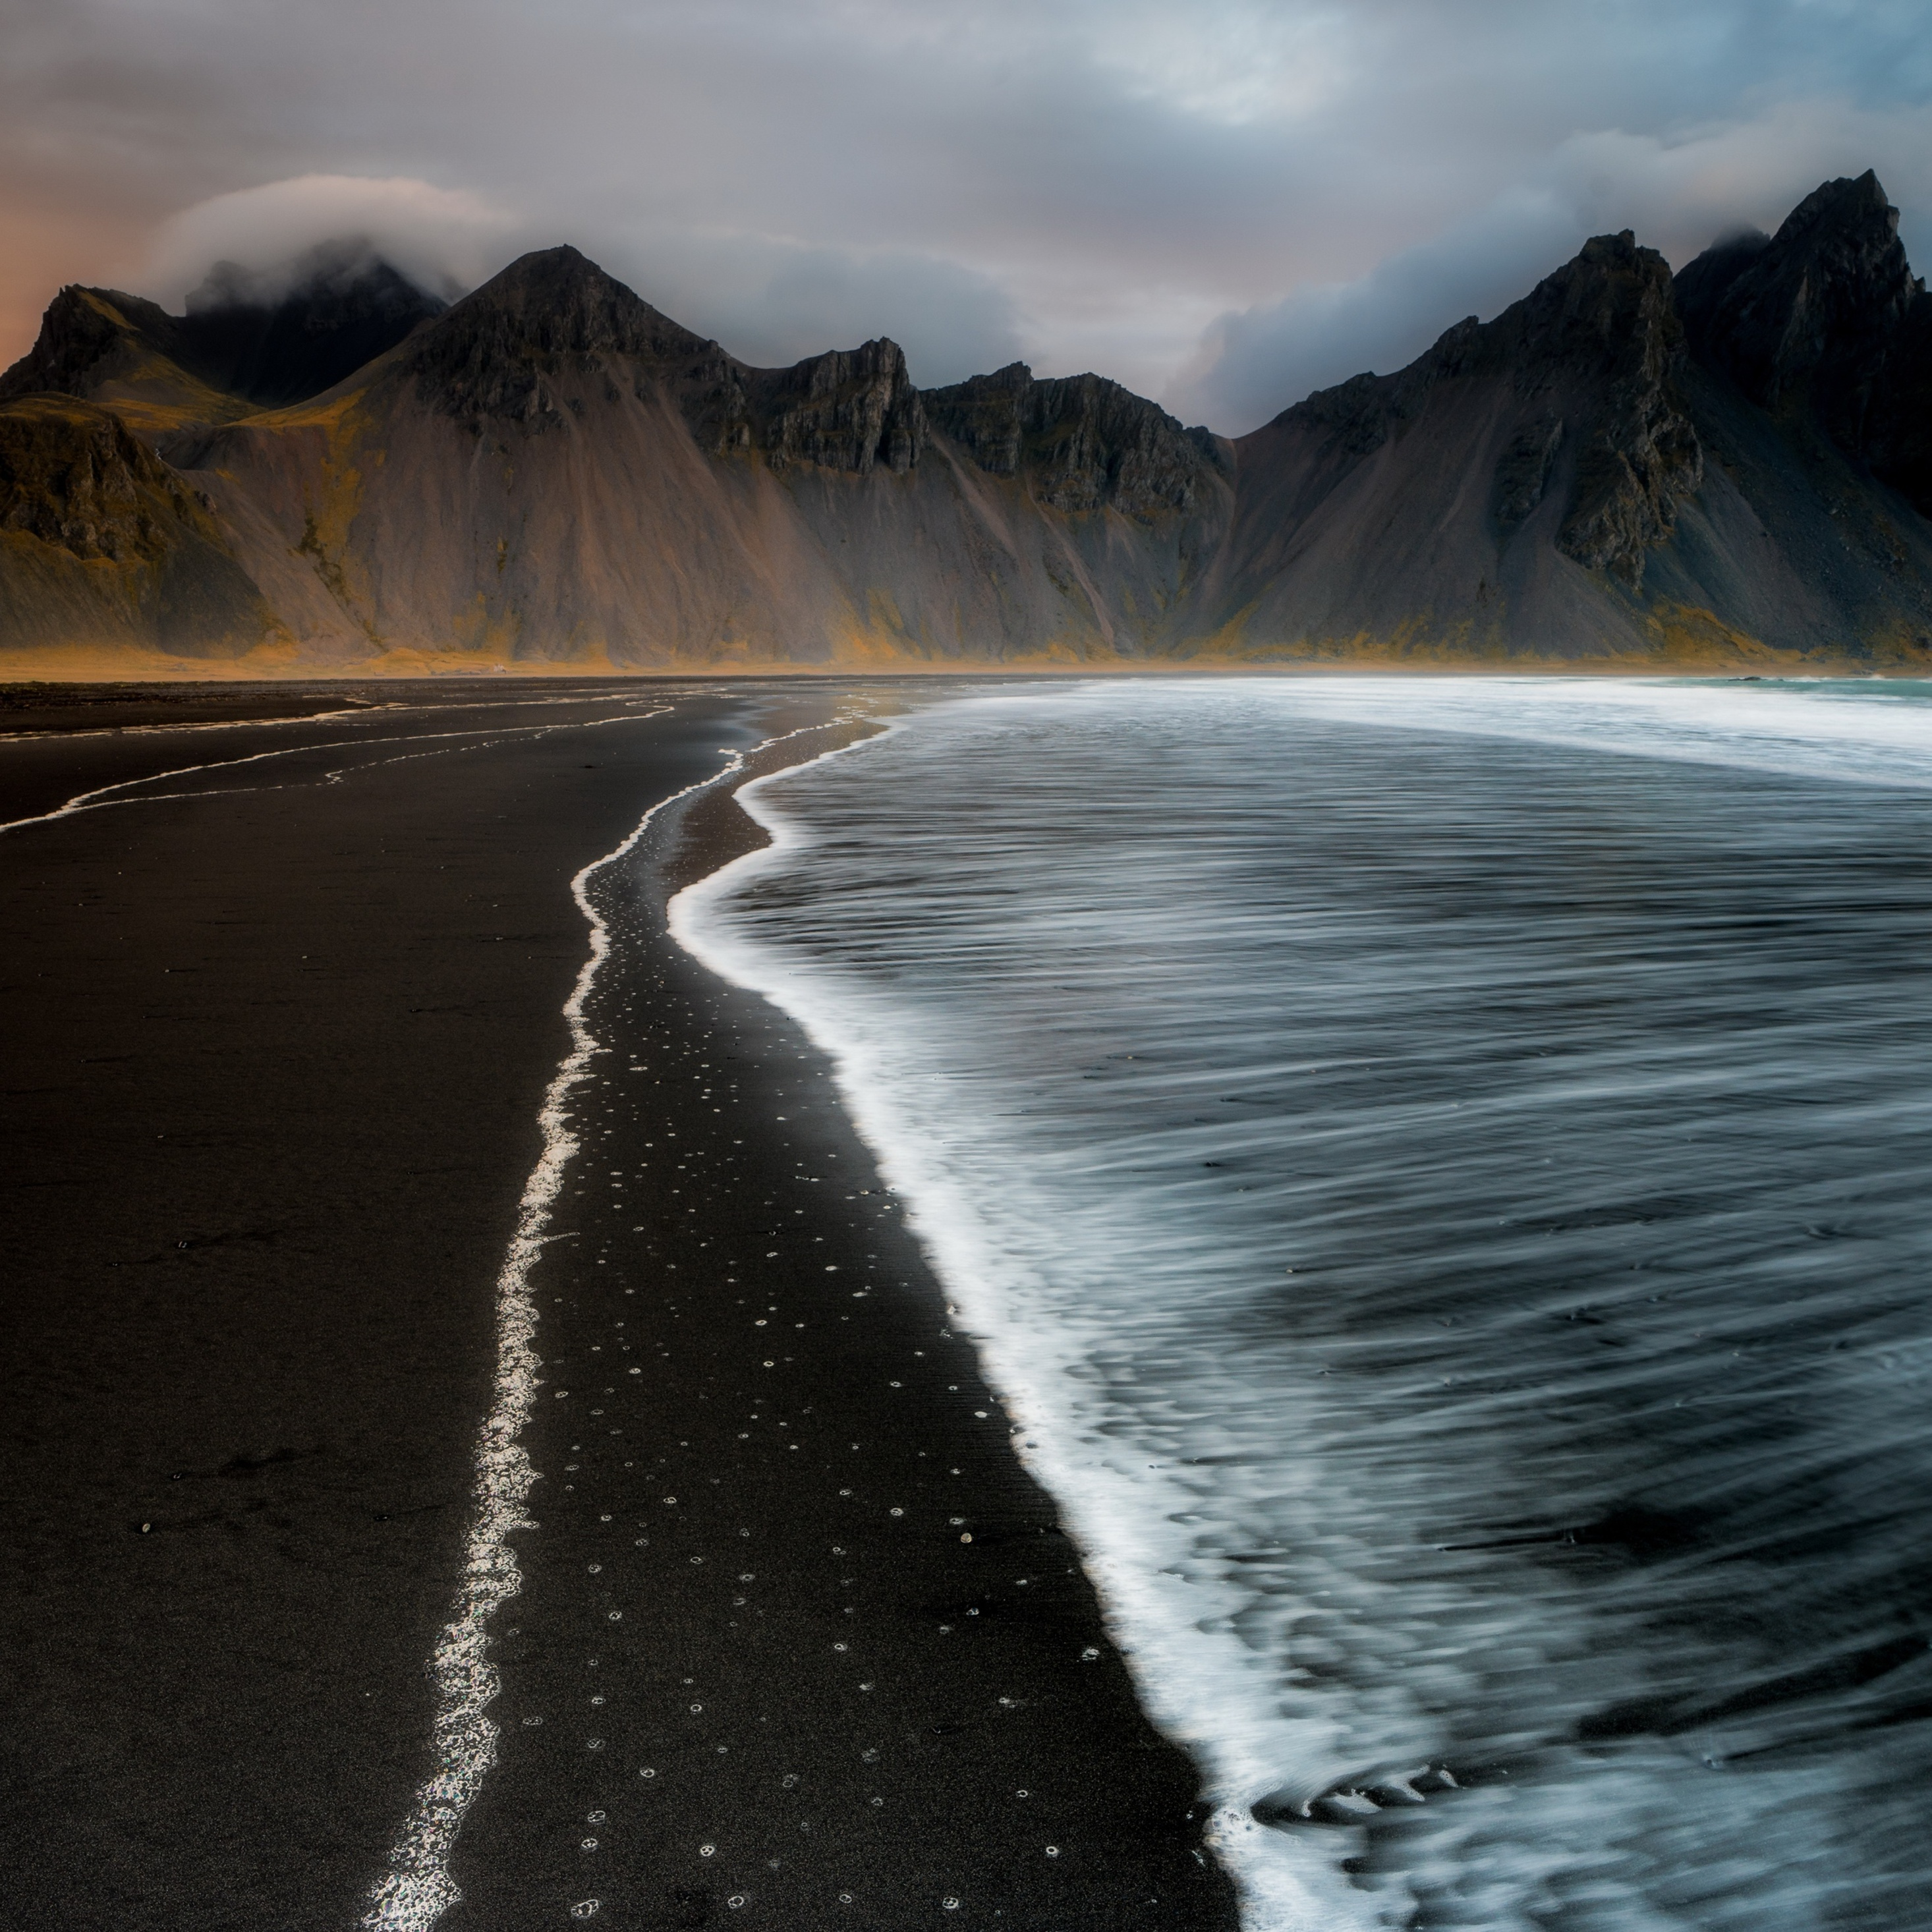 2932x2932 Beach Foam Iceland Mountain Nature 4k Ipad Pro